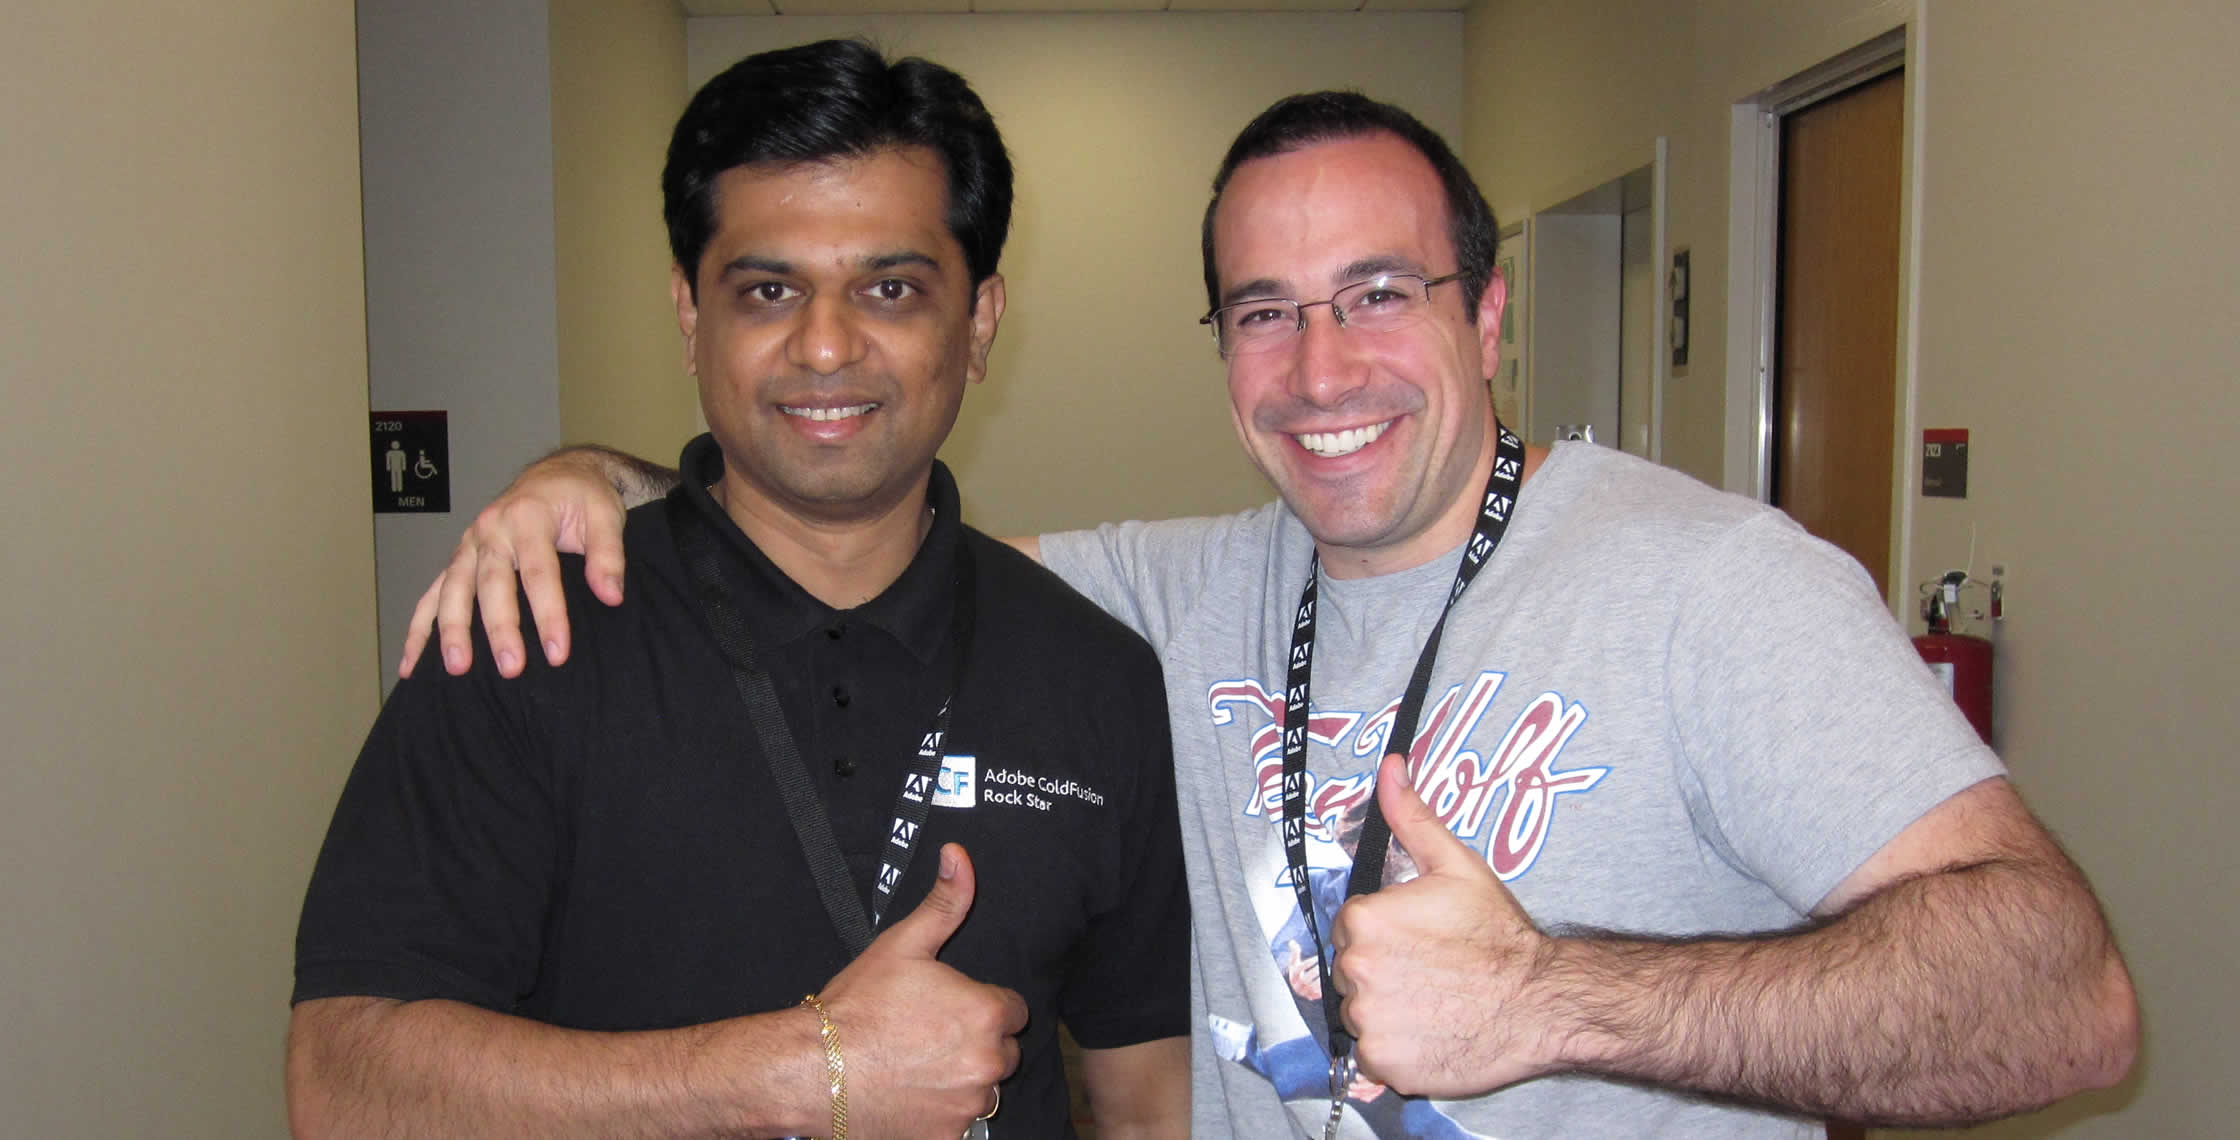 Ben Nadel at NCDevCon 2011 (Raleigh, NC) with: Ramchandra Kulkarni